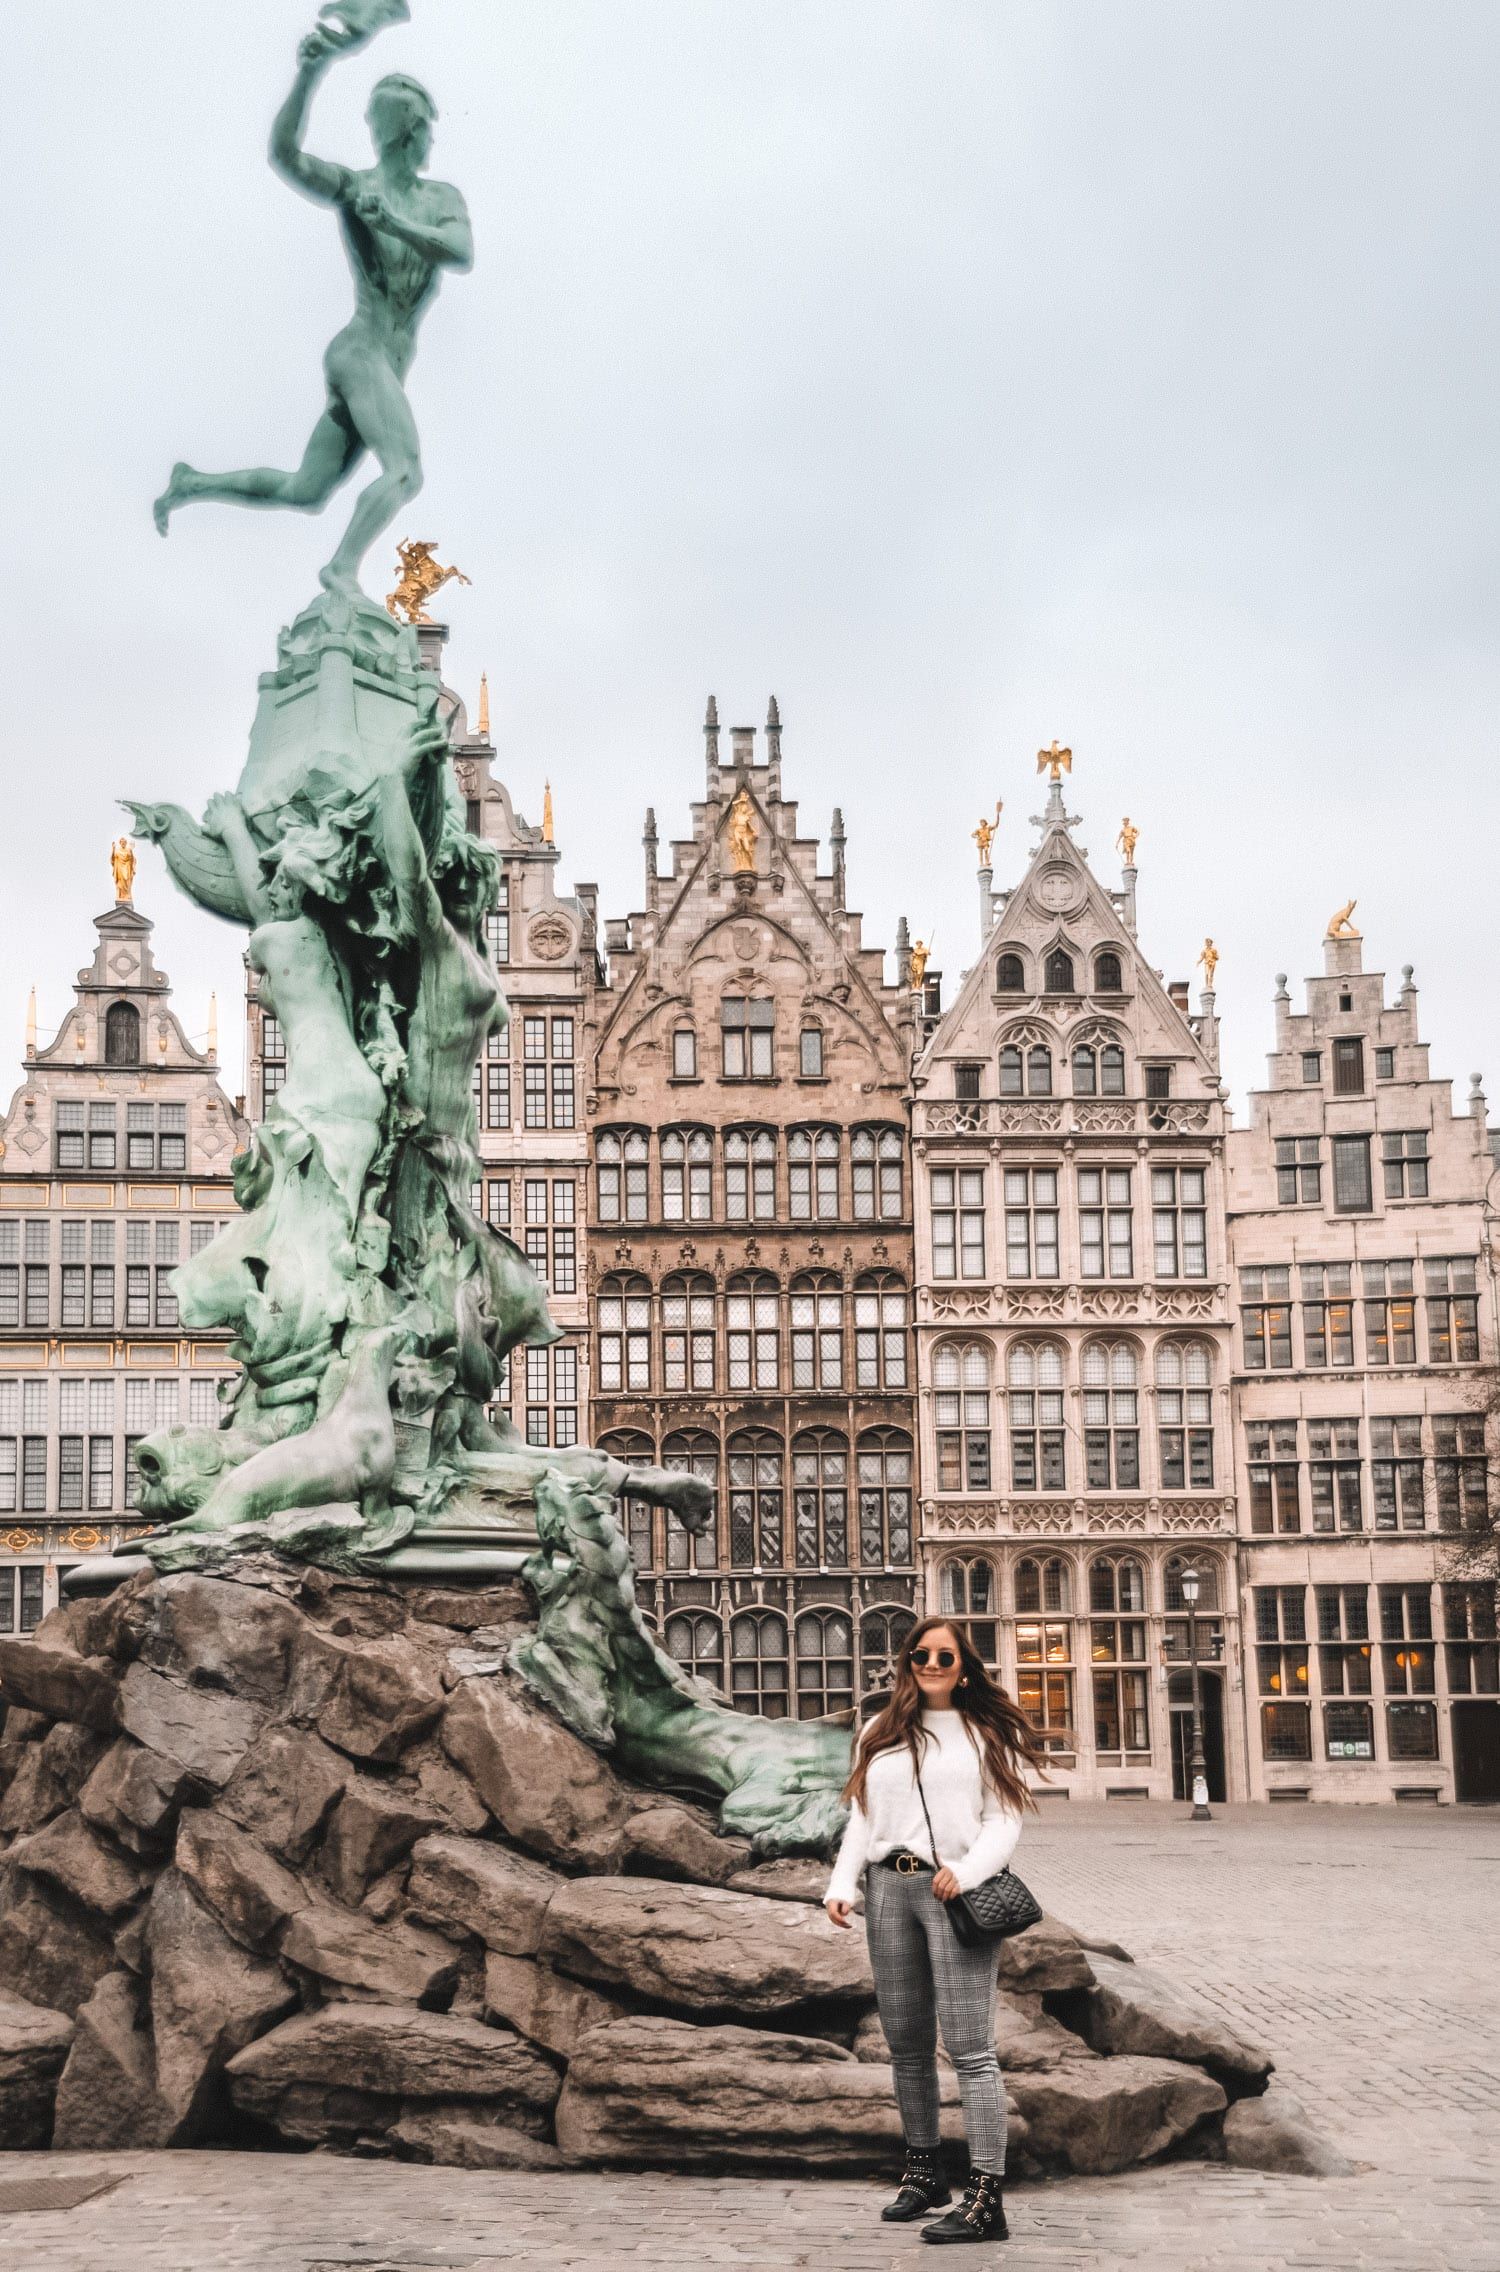 Grote Markt |Sevärdheter i Antwerpen, Belgien